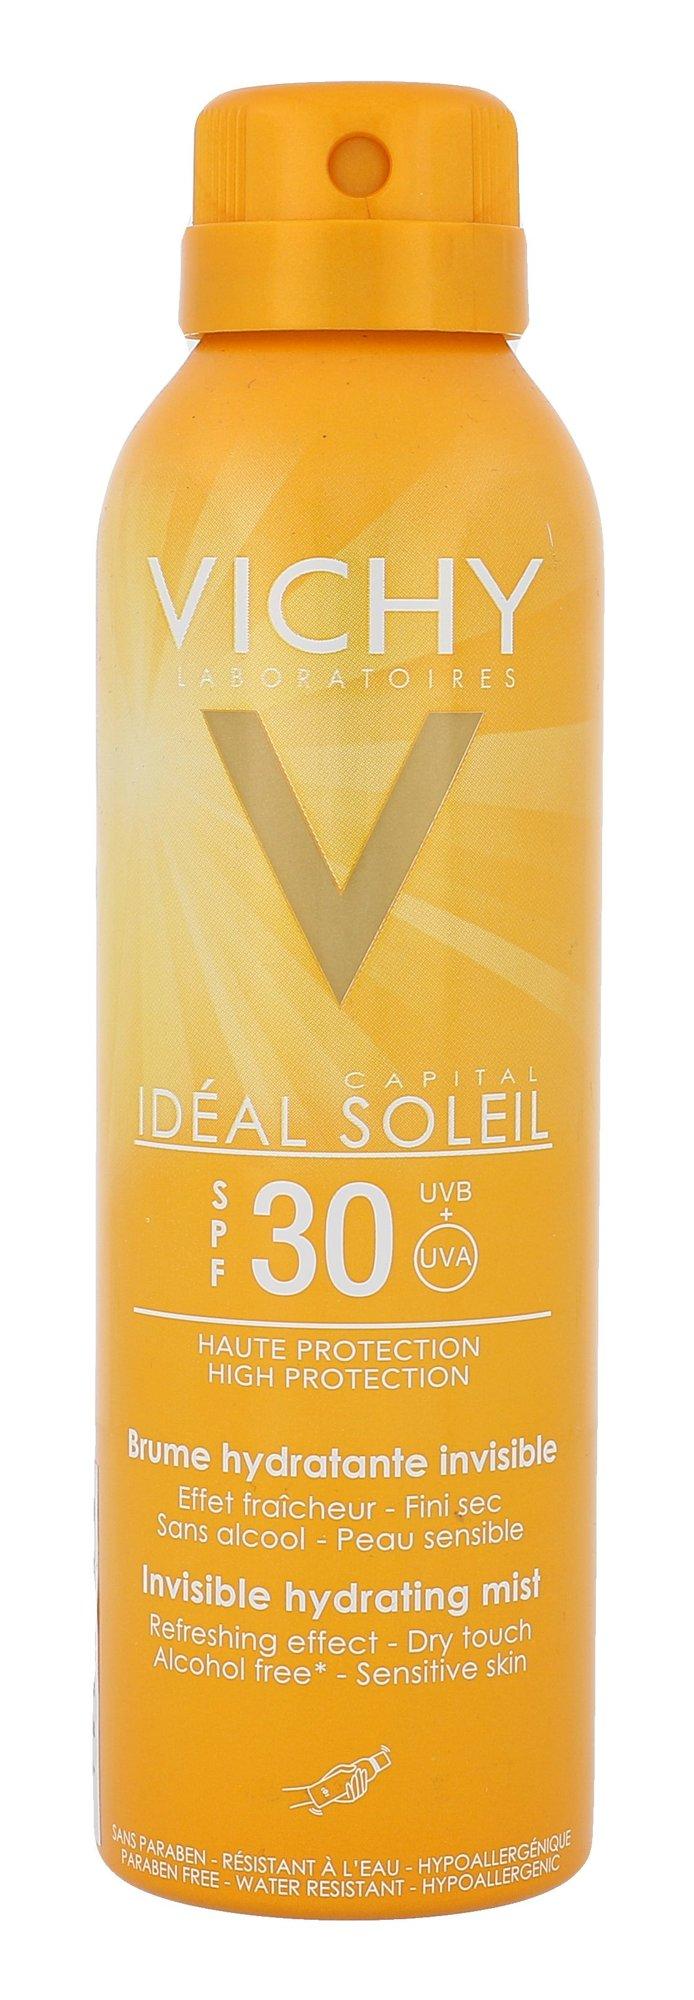 Vichy Idéal Soleil Cosmetic 200ml